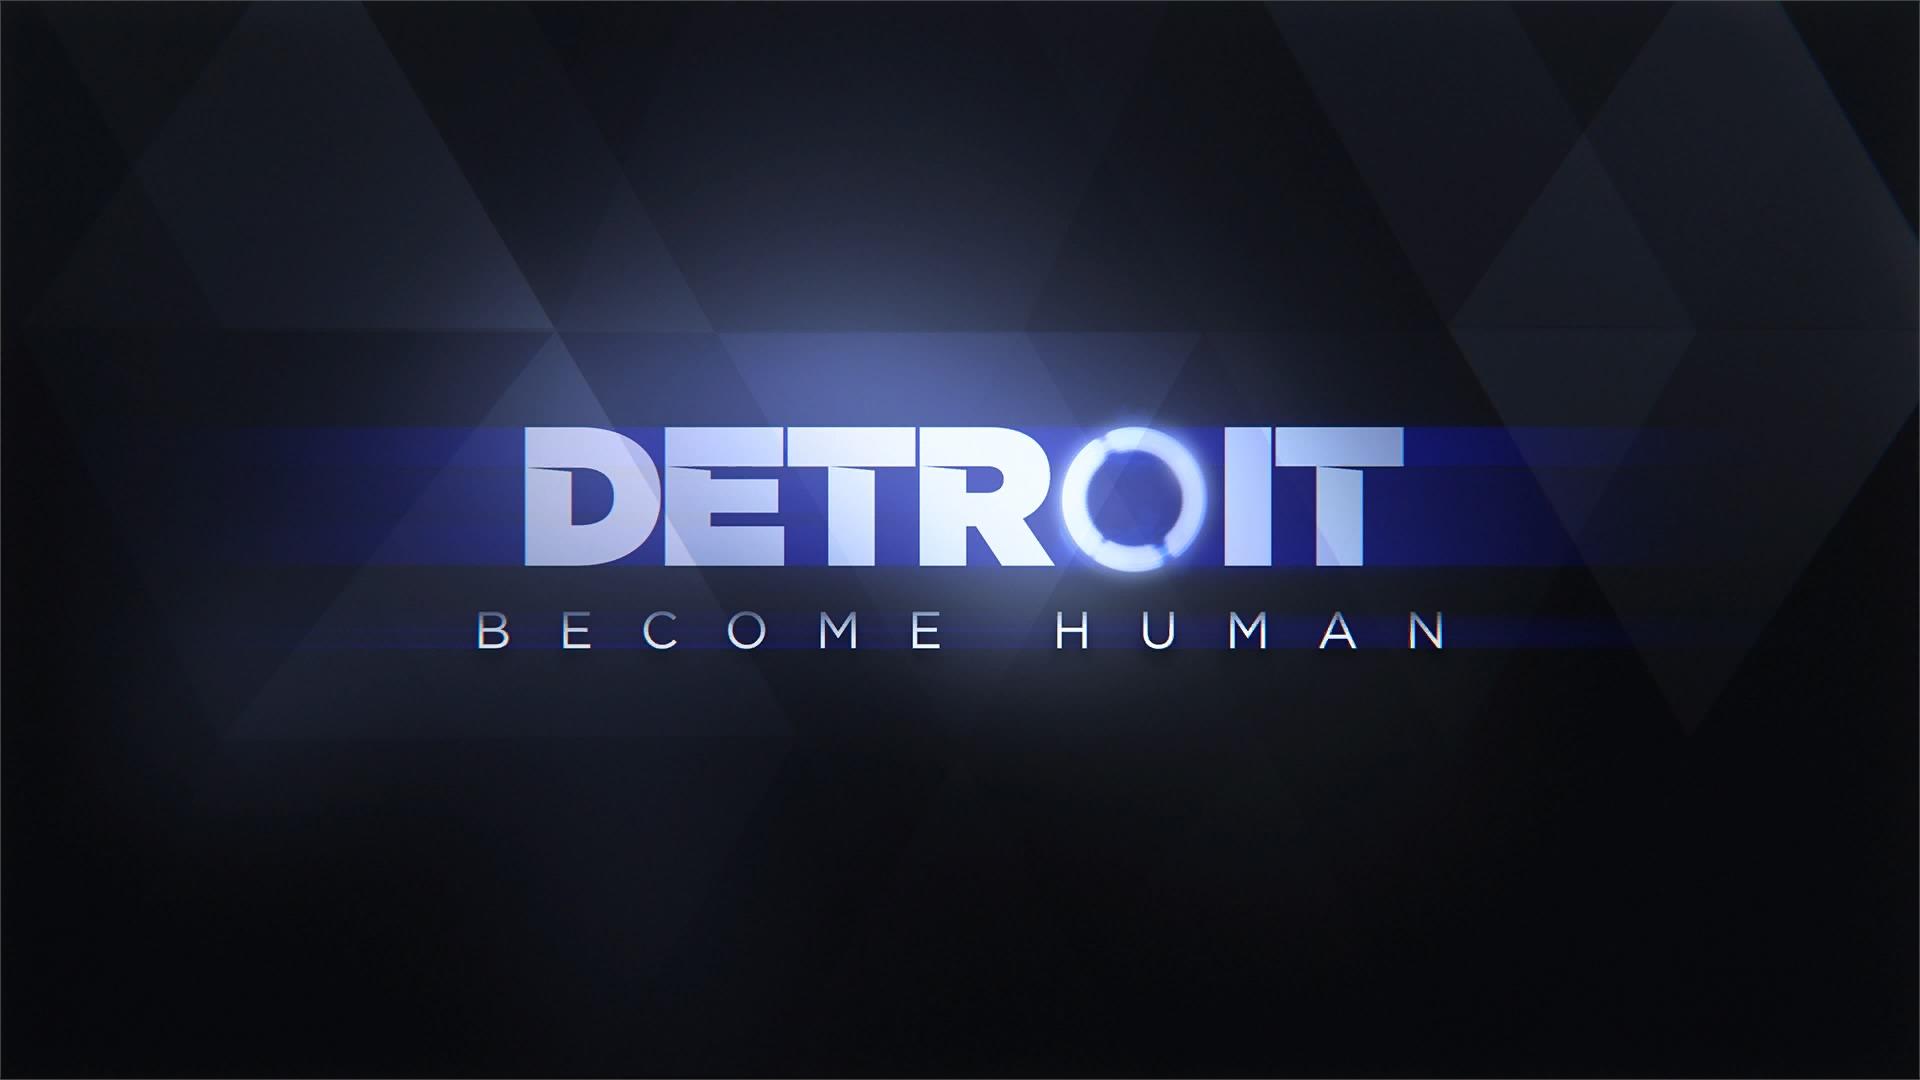 Detroit_ Become Human_20190318161304.jpg